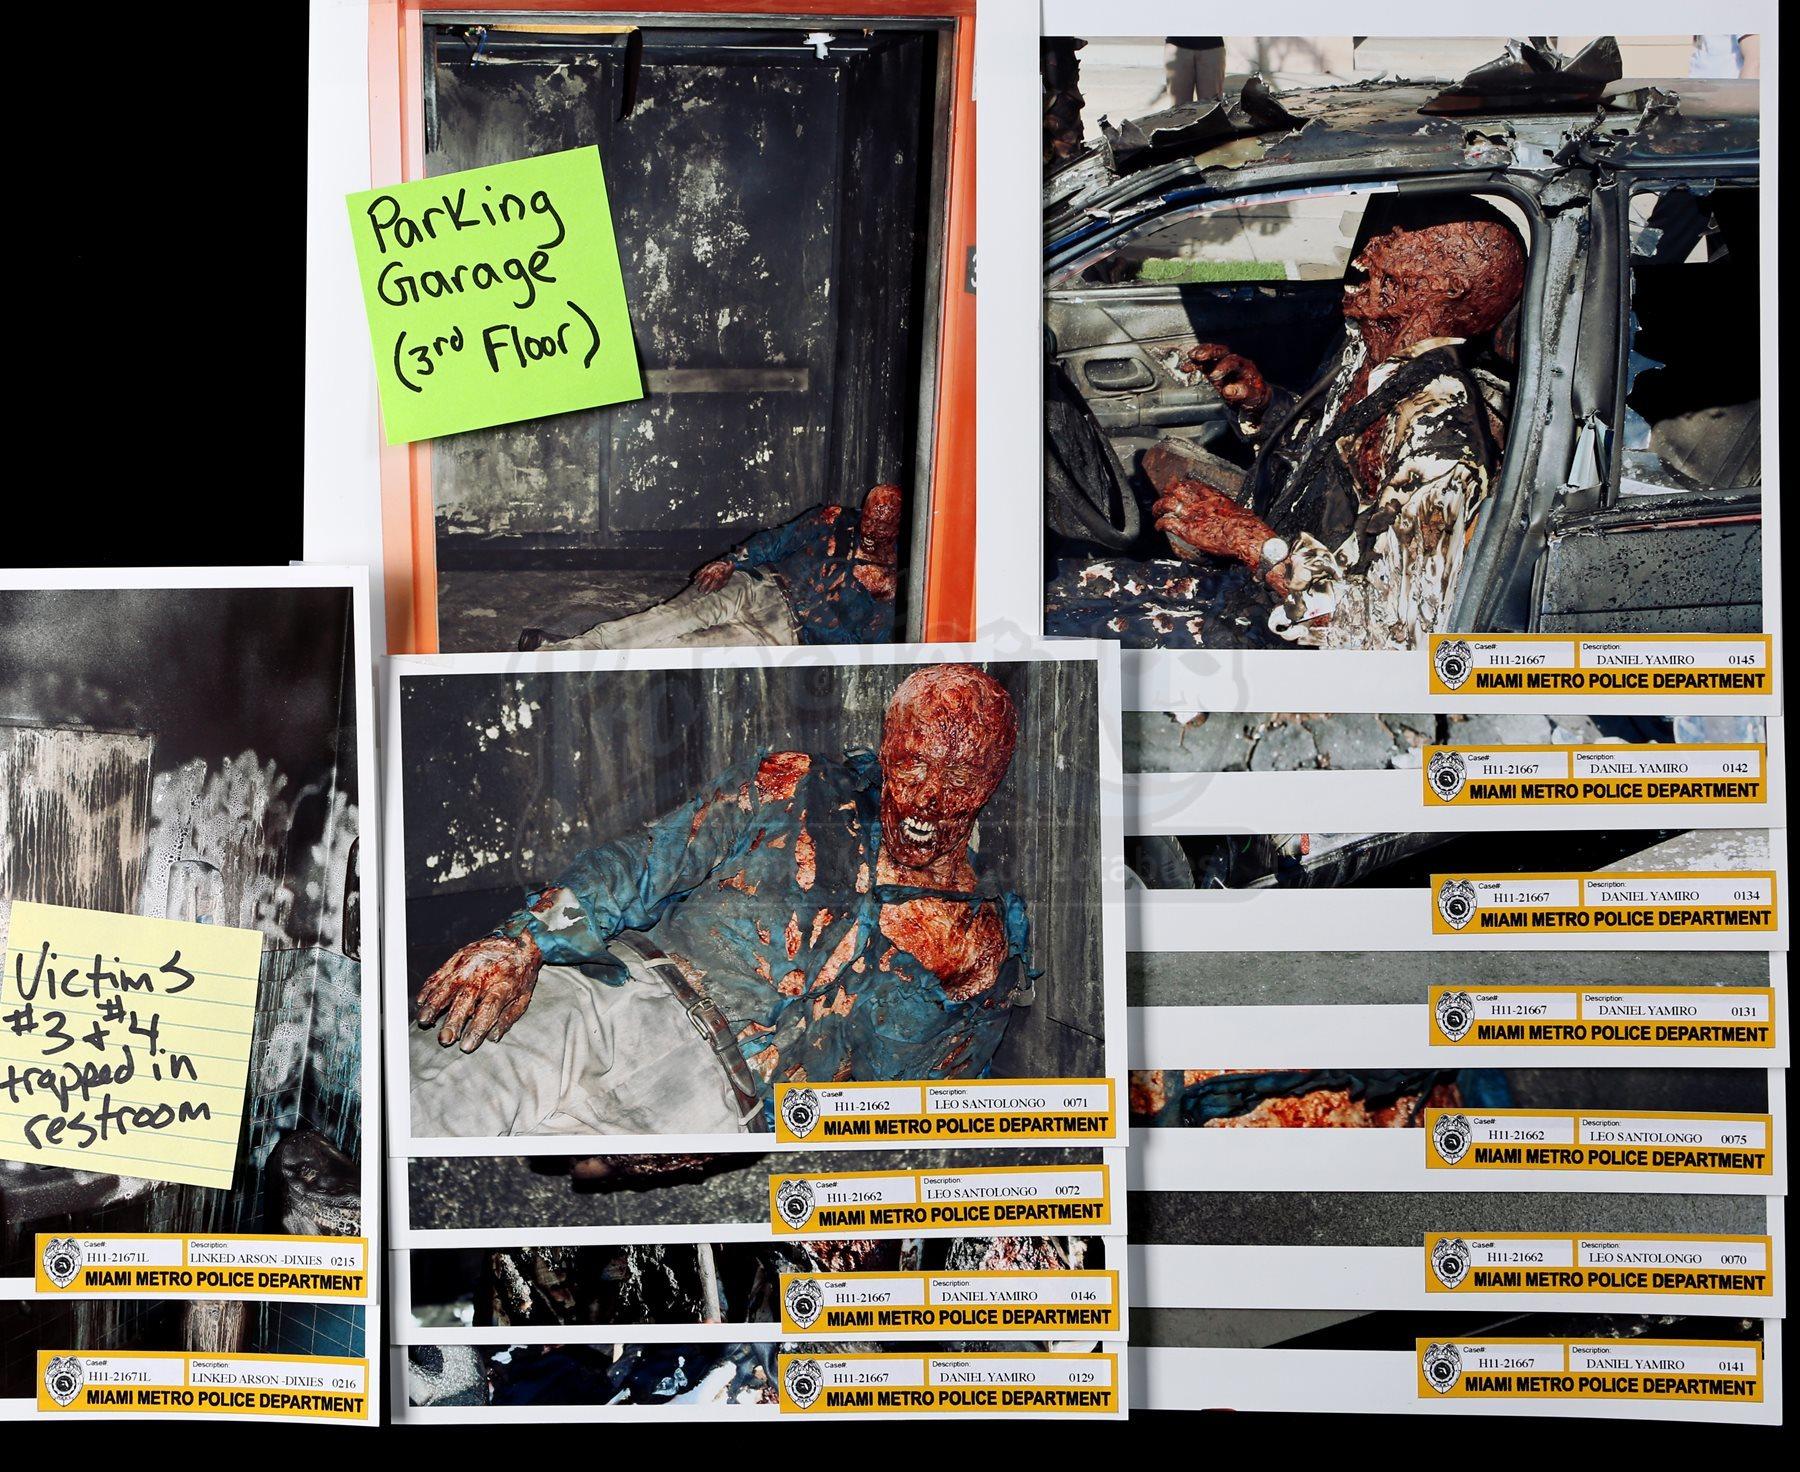 SEASON 7 - Crime Scene Photographs - Current price: $300